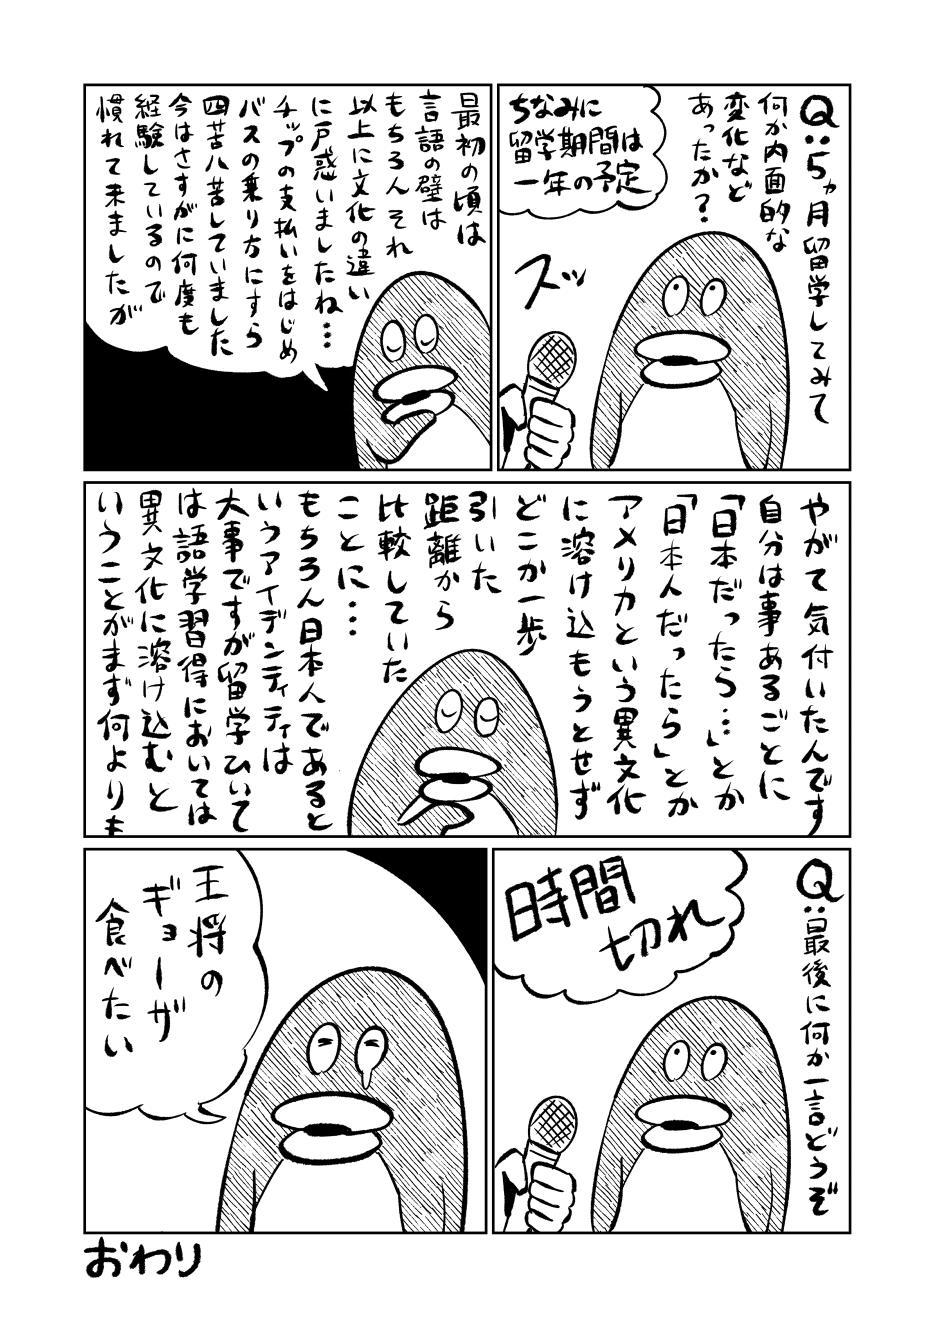 https://www.ryugaku.co.jp/blog/els_portland/upload/5d68b811dbba3e7858f5fac94dfe7e0188fe7285.jpg